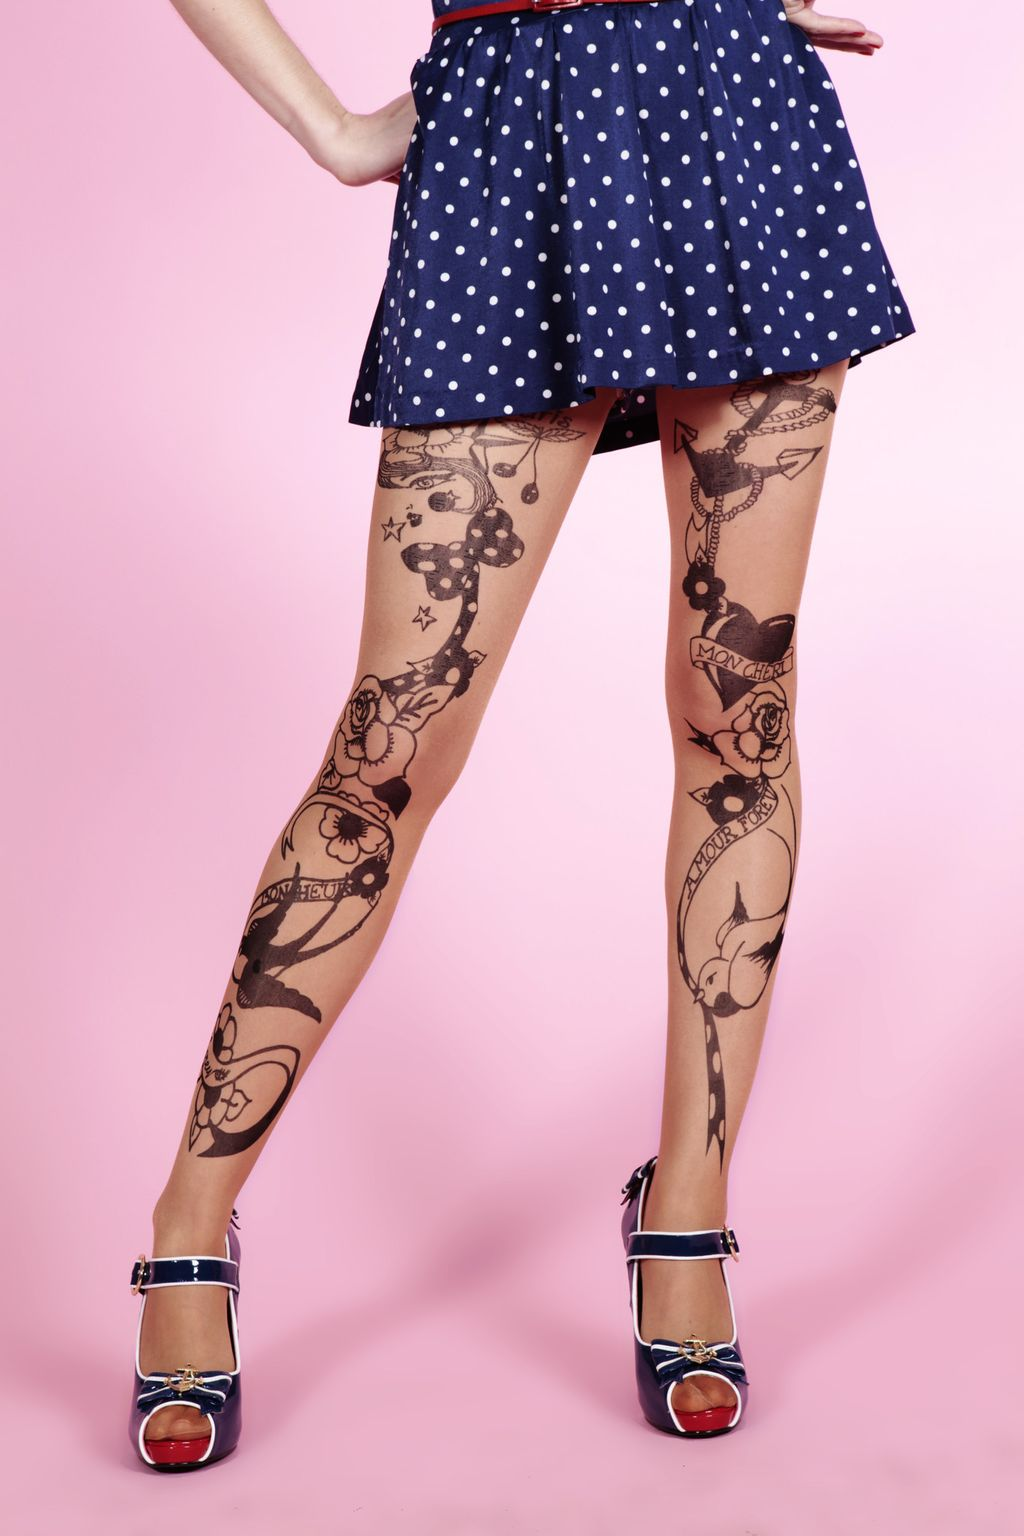 5 jeunes créateurs qui s'inspirent de l'univers tattoo